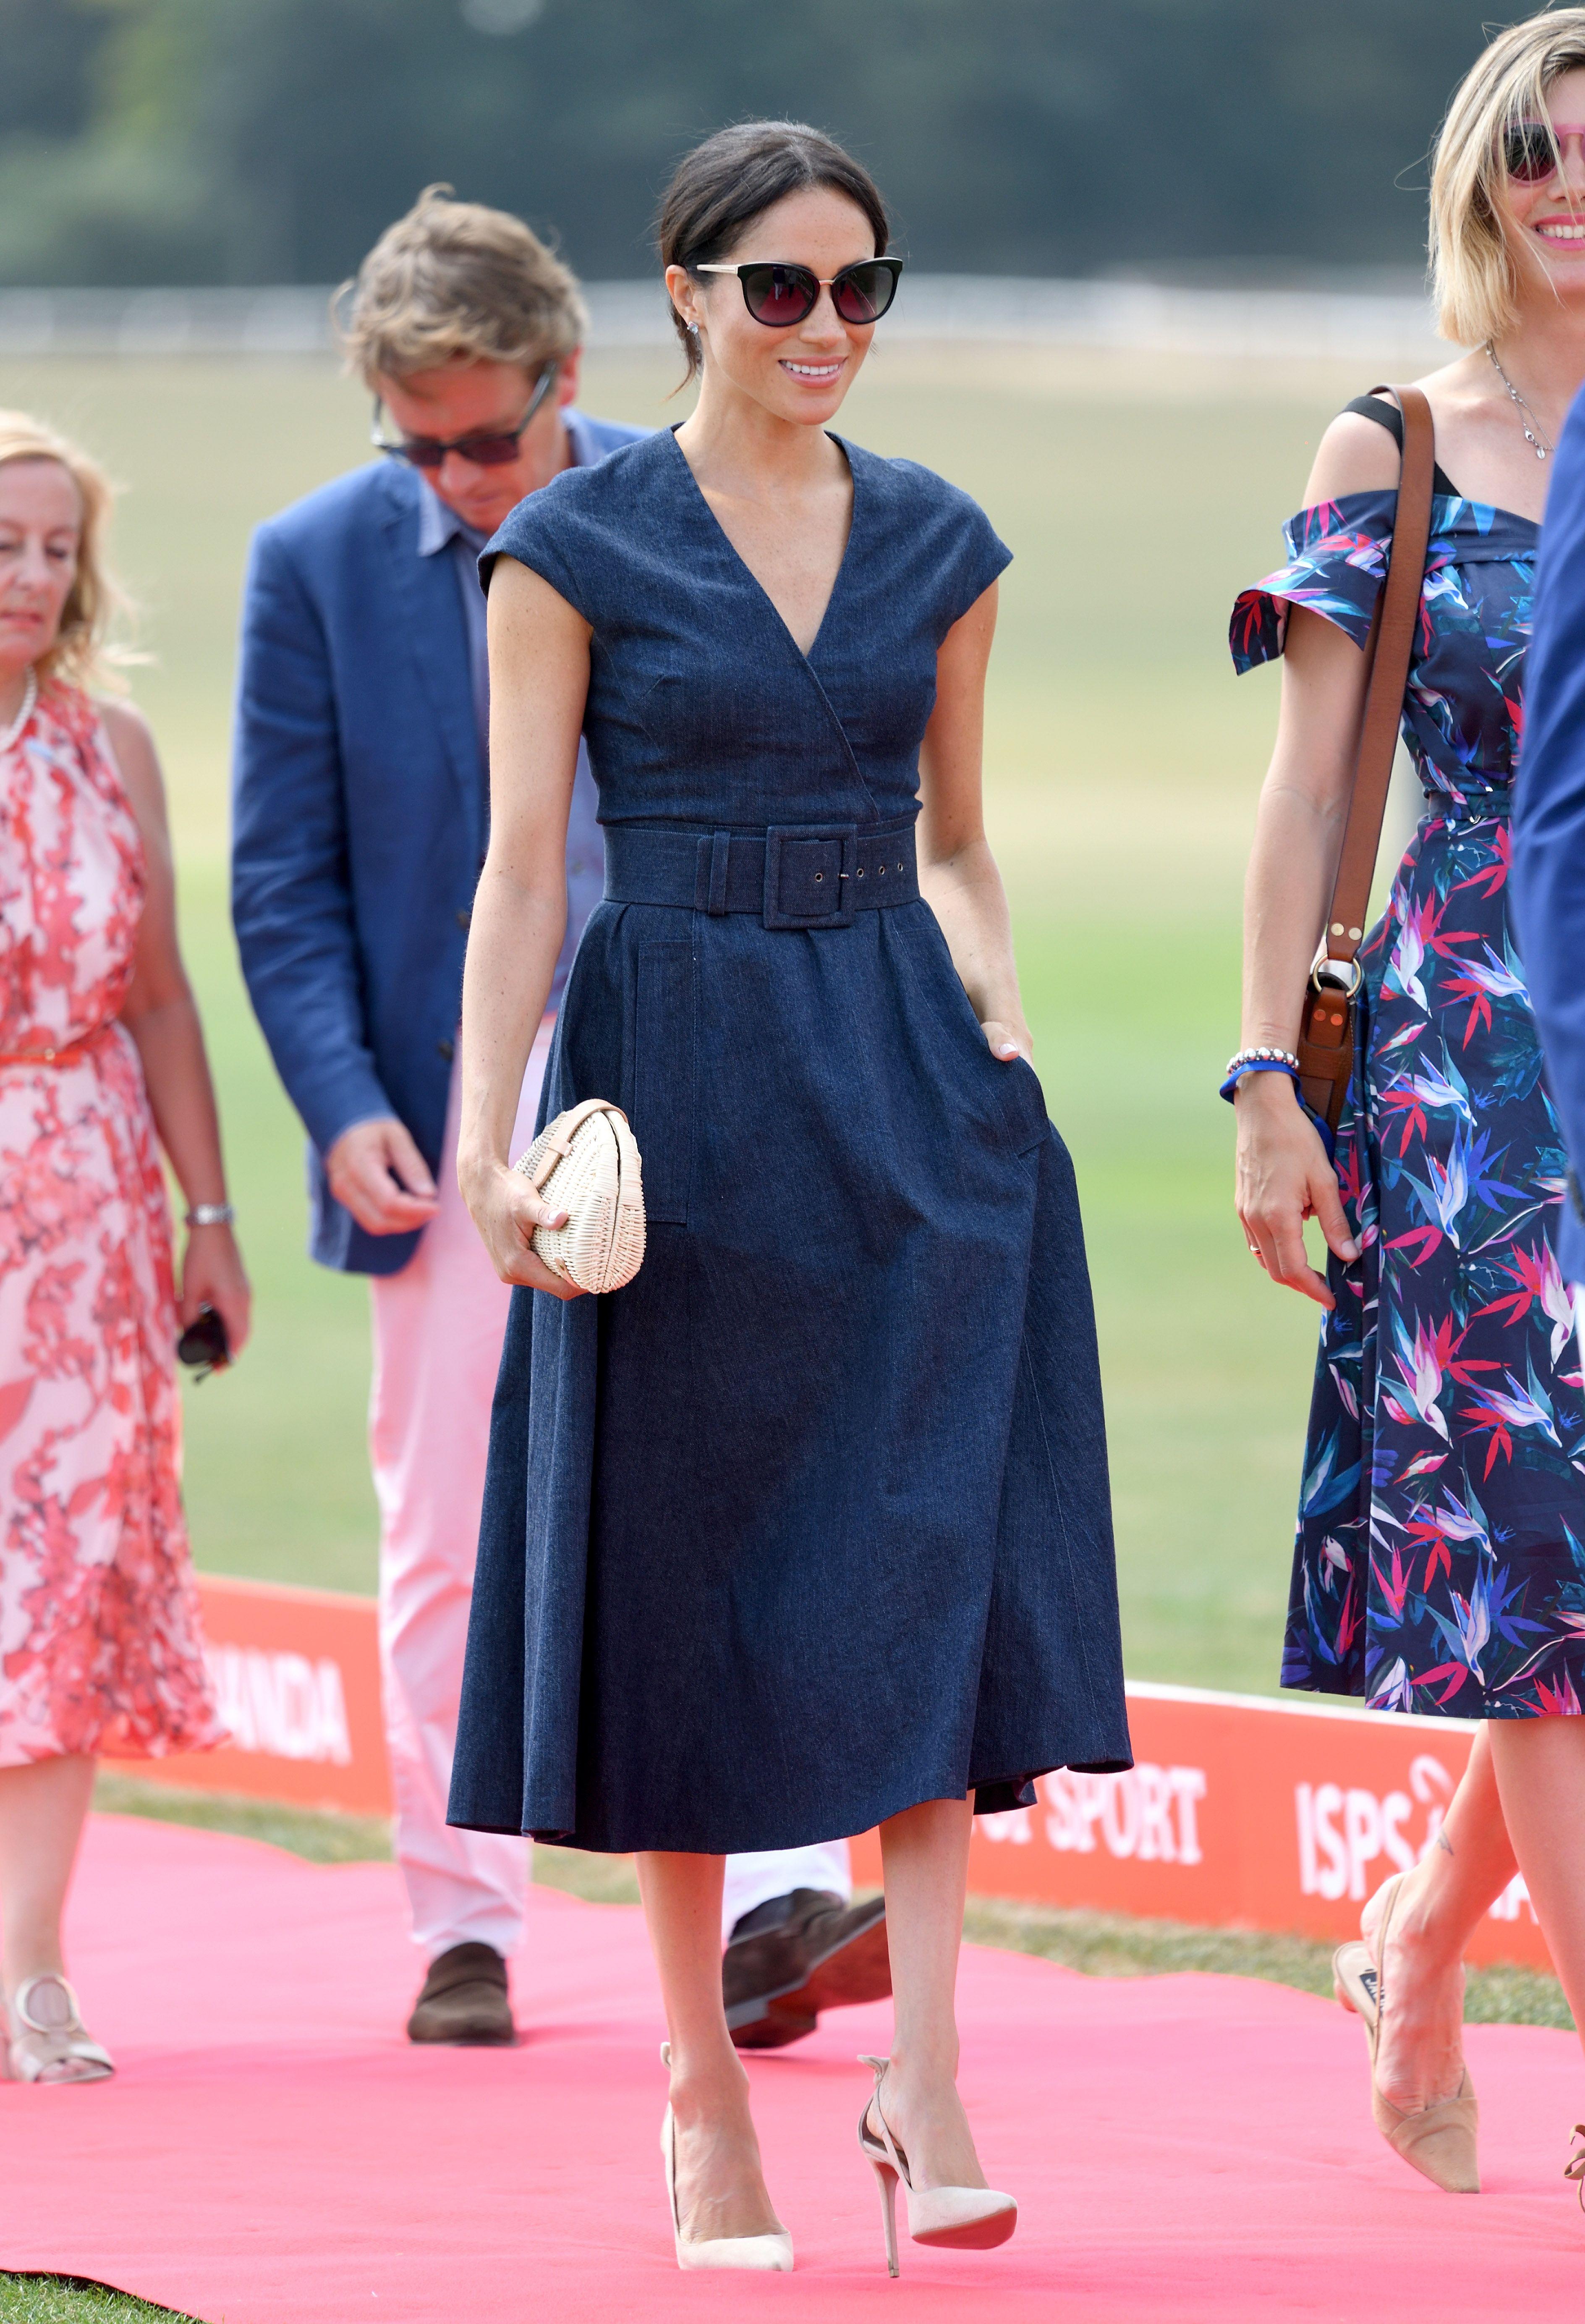 ff369e3c99 Meghan Markle in Denim Carolina Herrera Dress With Prince Harry at  Sentebale Polo 2018